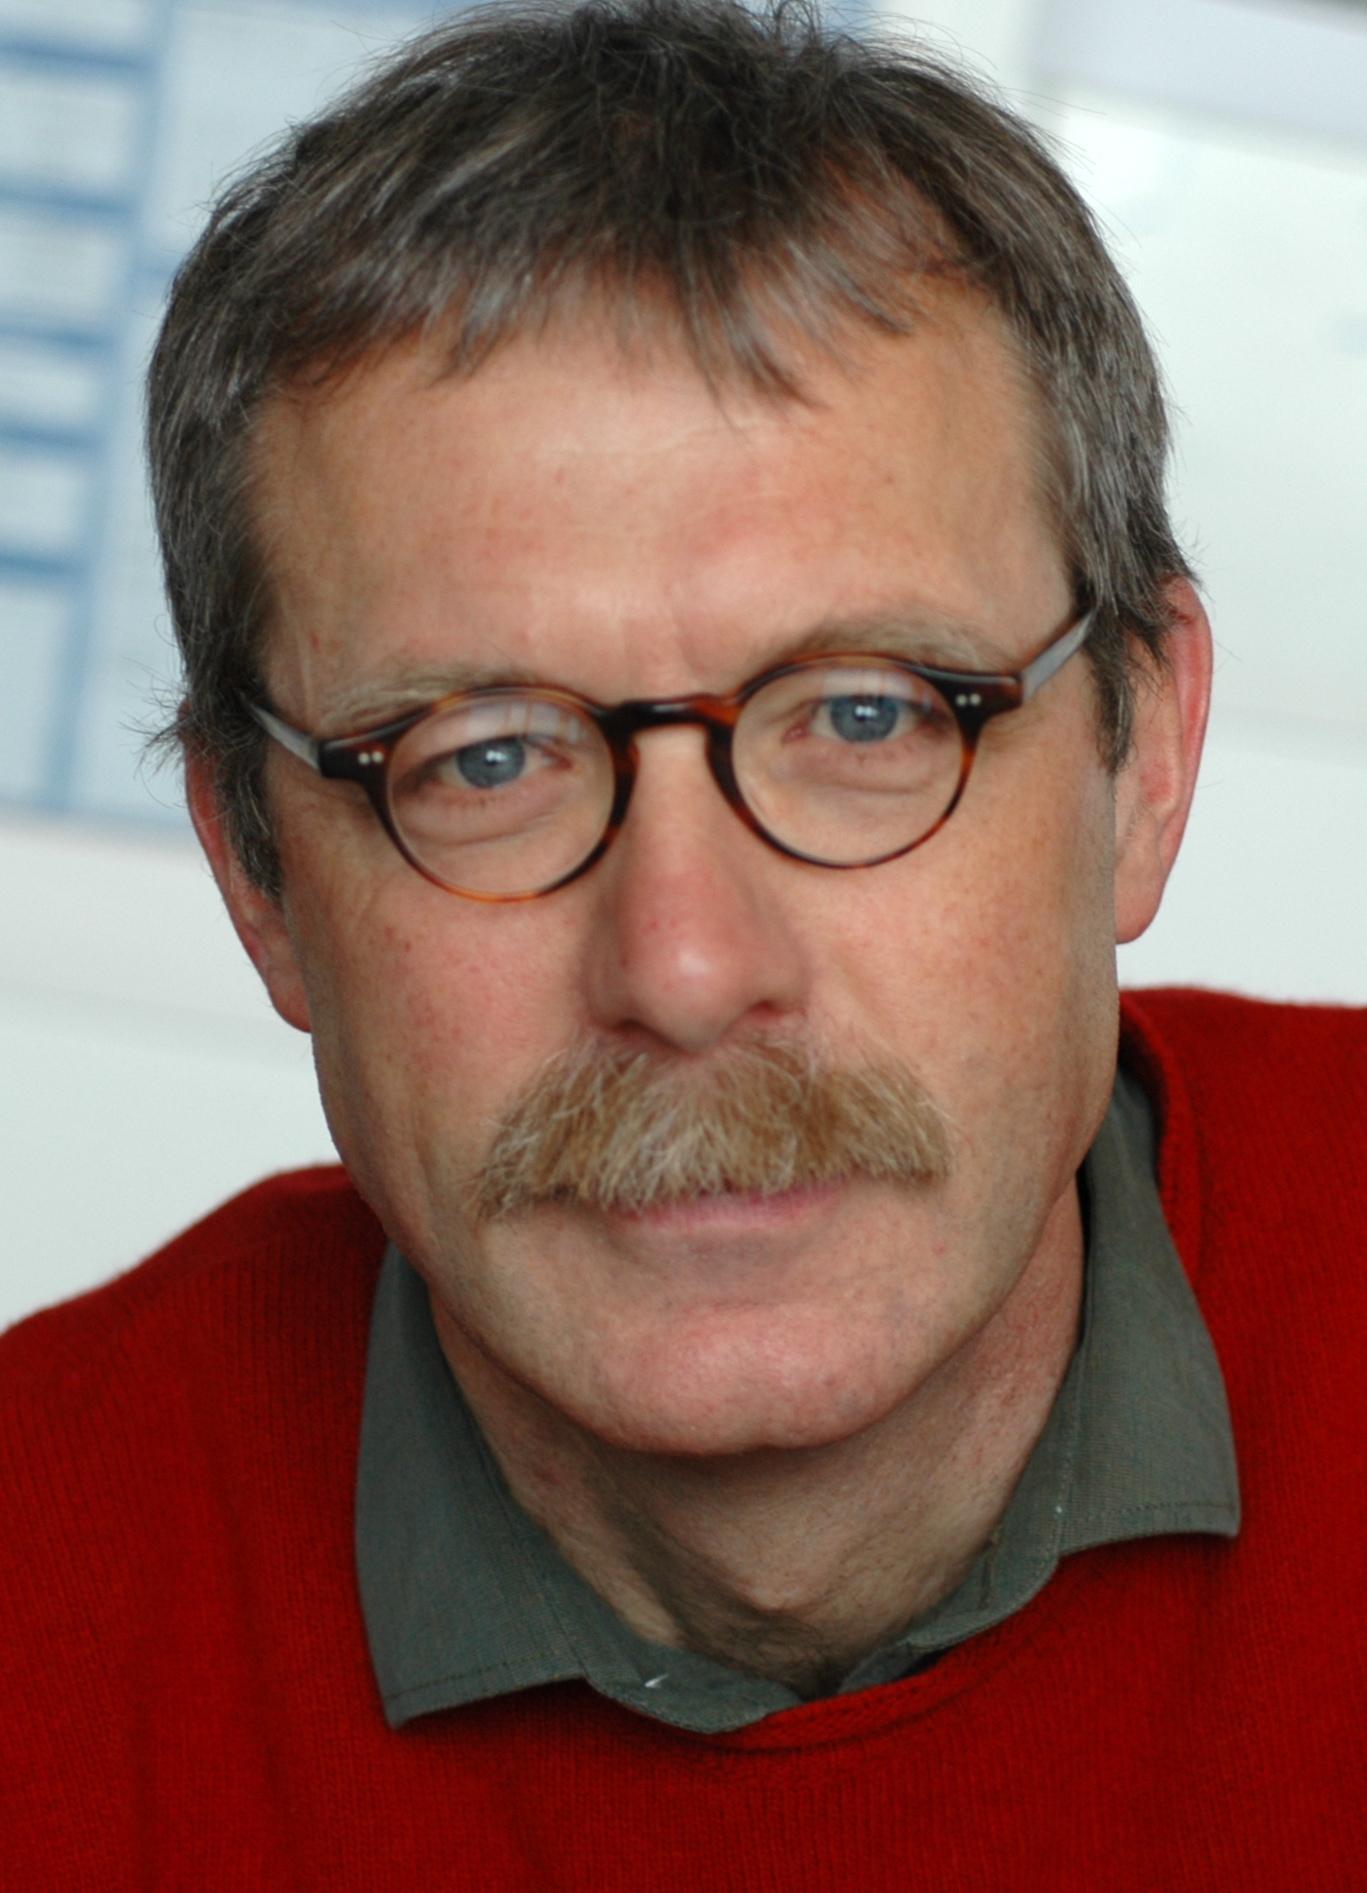 Bernd Aatz